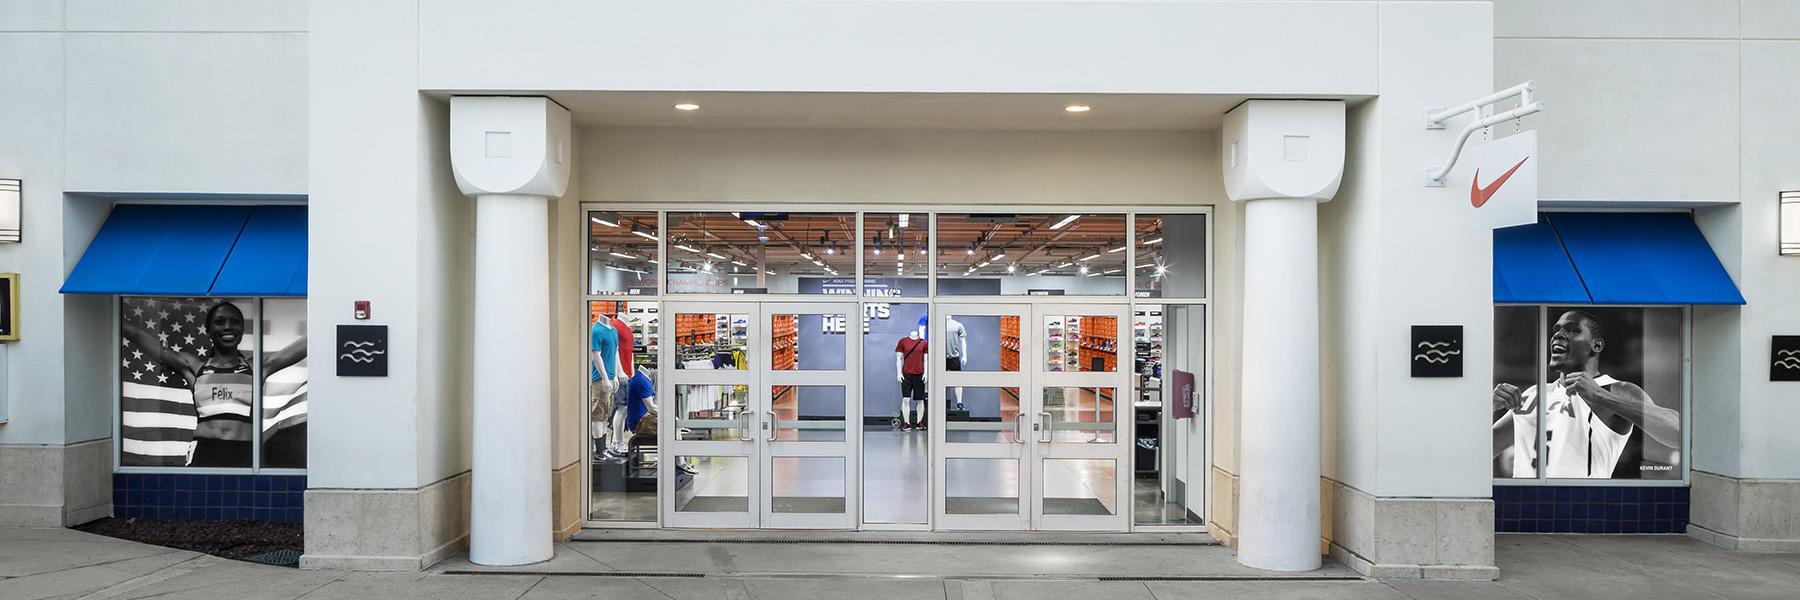 6308f32f8710 Nike Factory Store - Orlando Vineland. Orlando